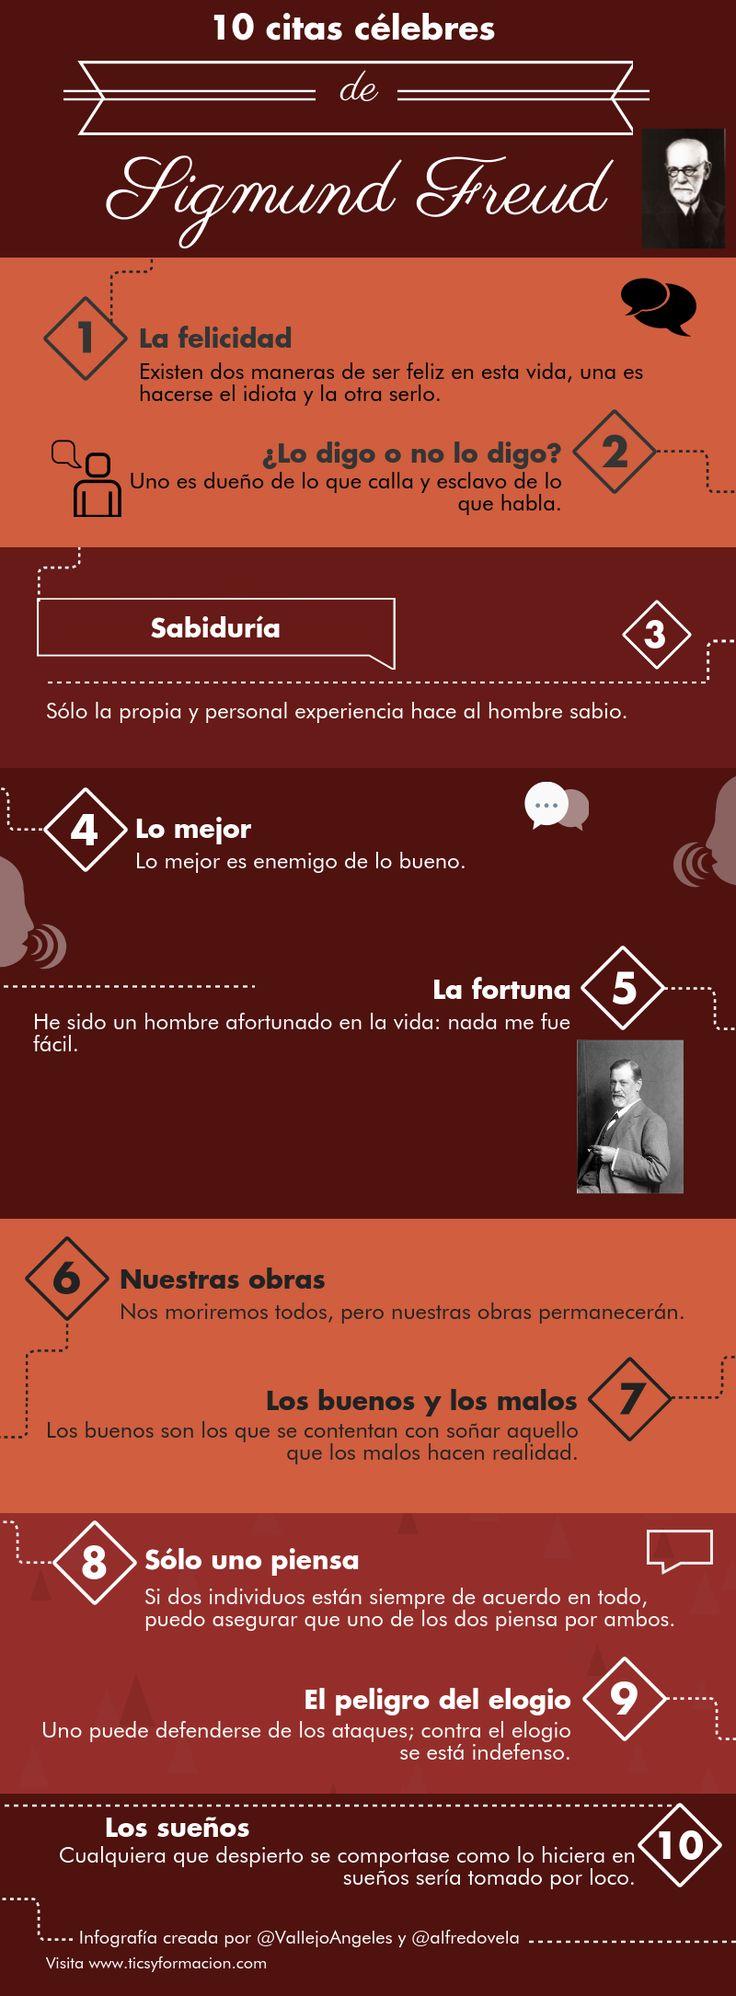 10 citas célebres de Sigmund Freud #quotes